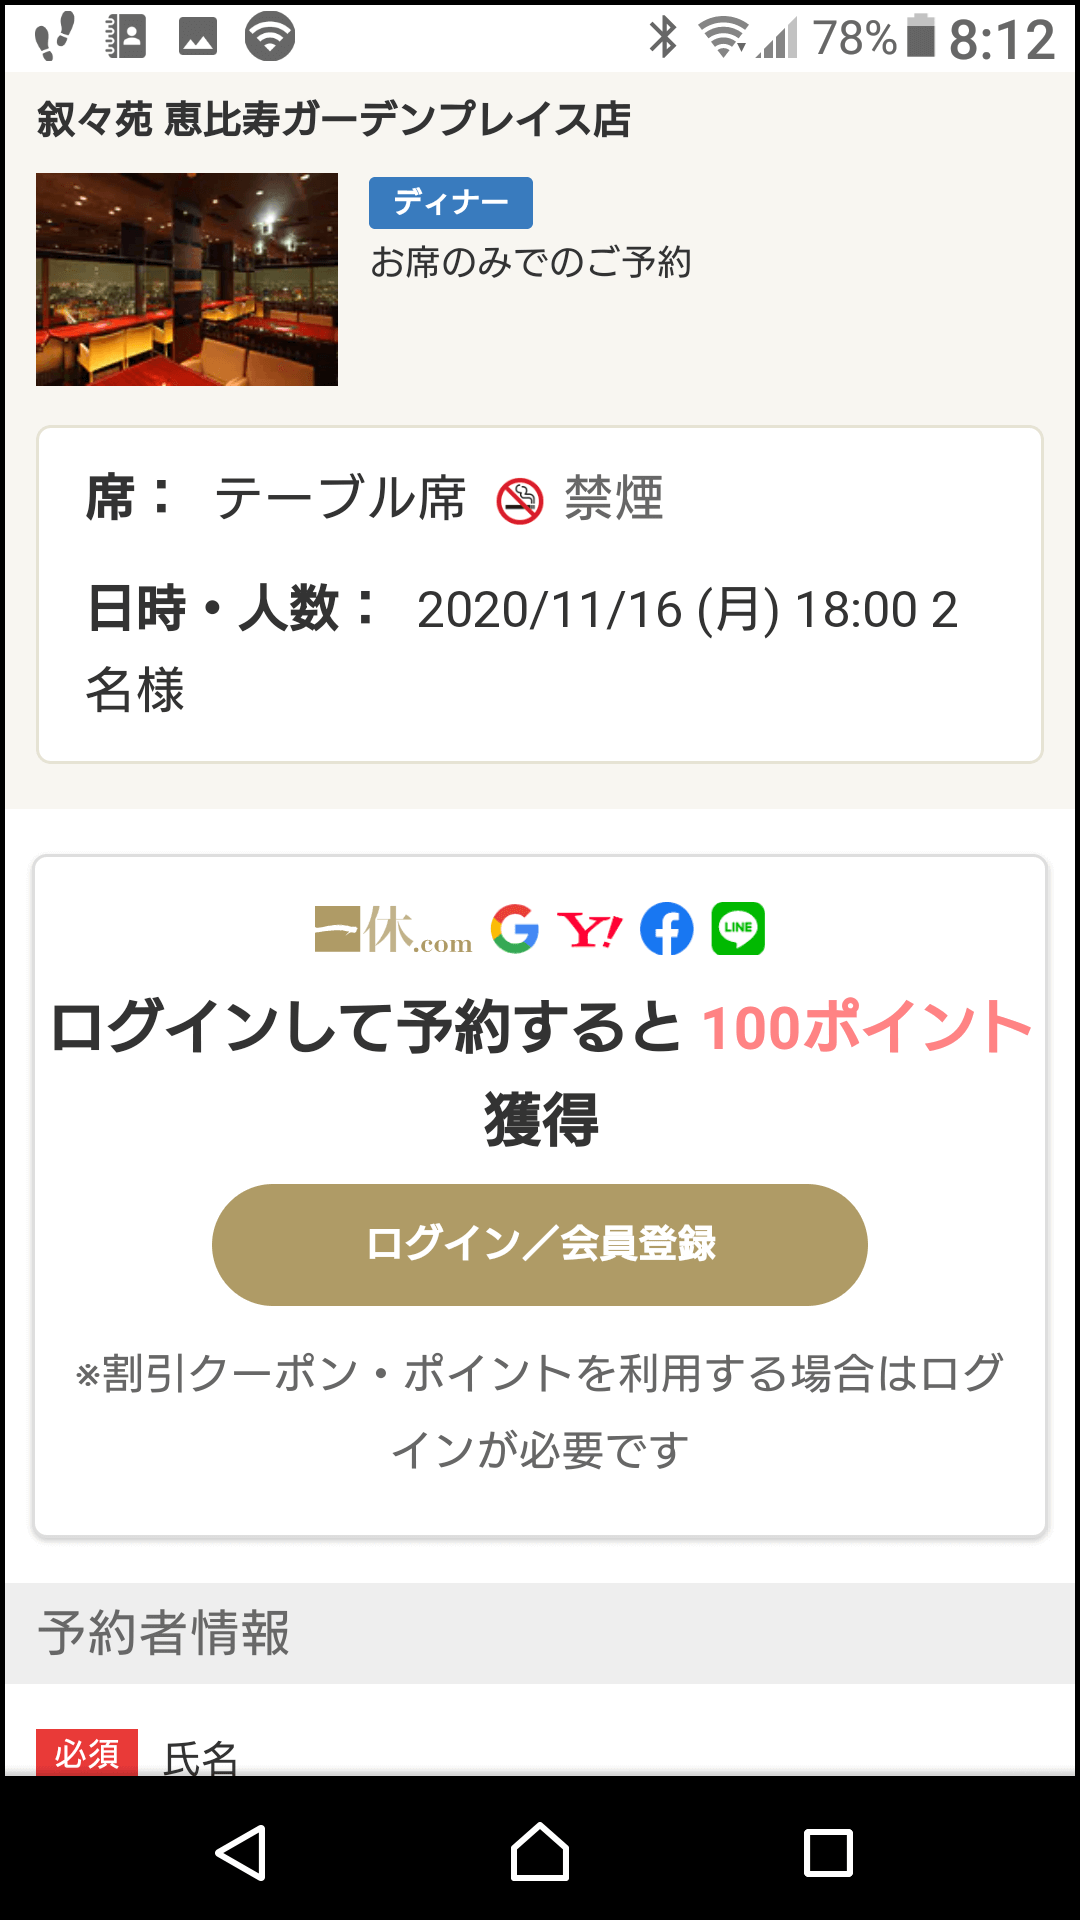 無料会員登録の画面